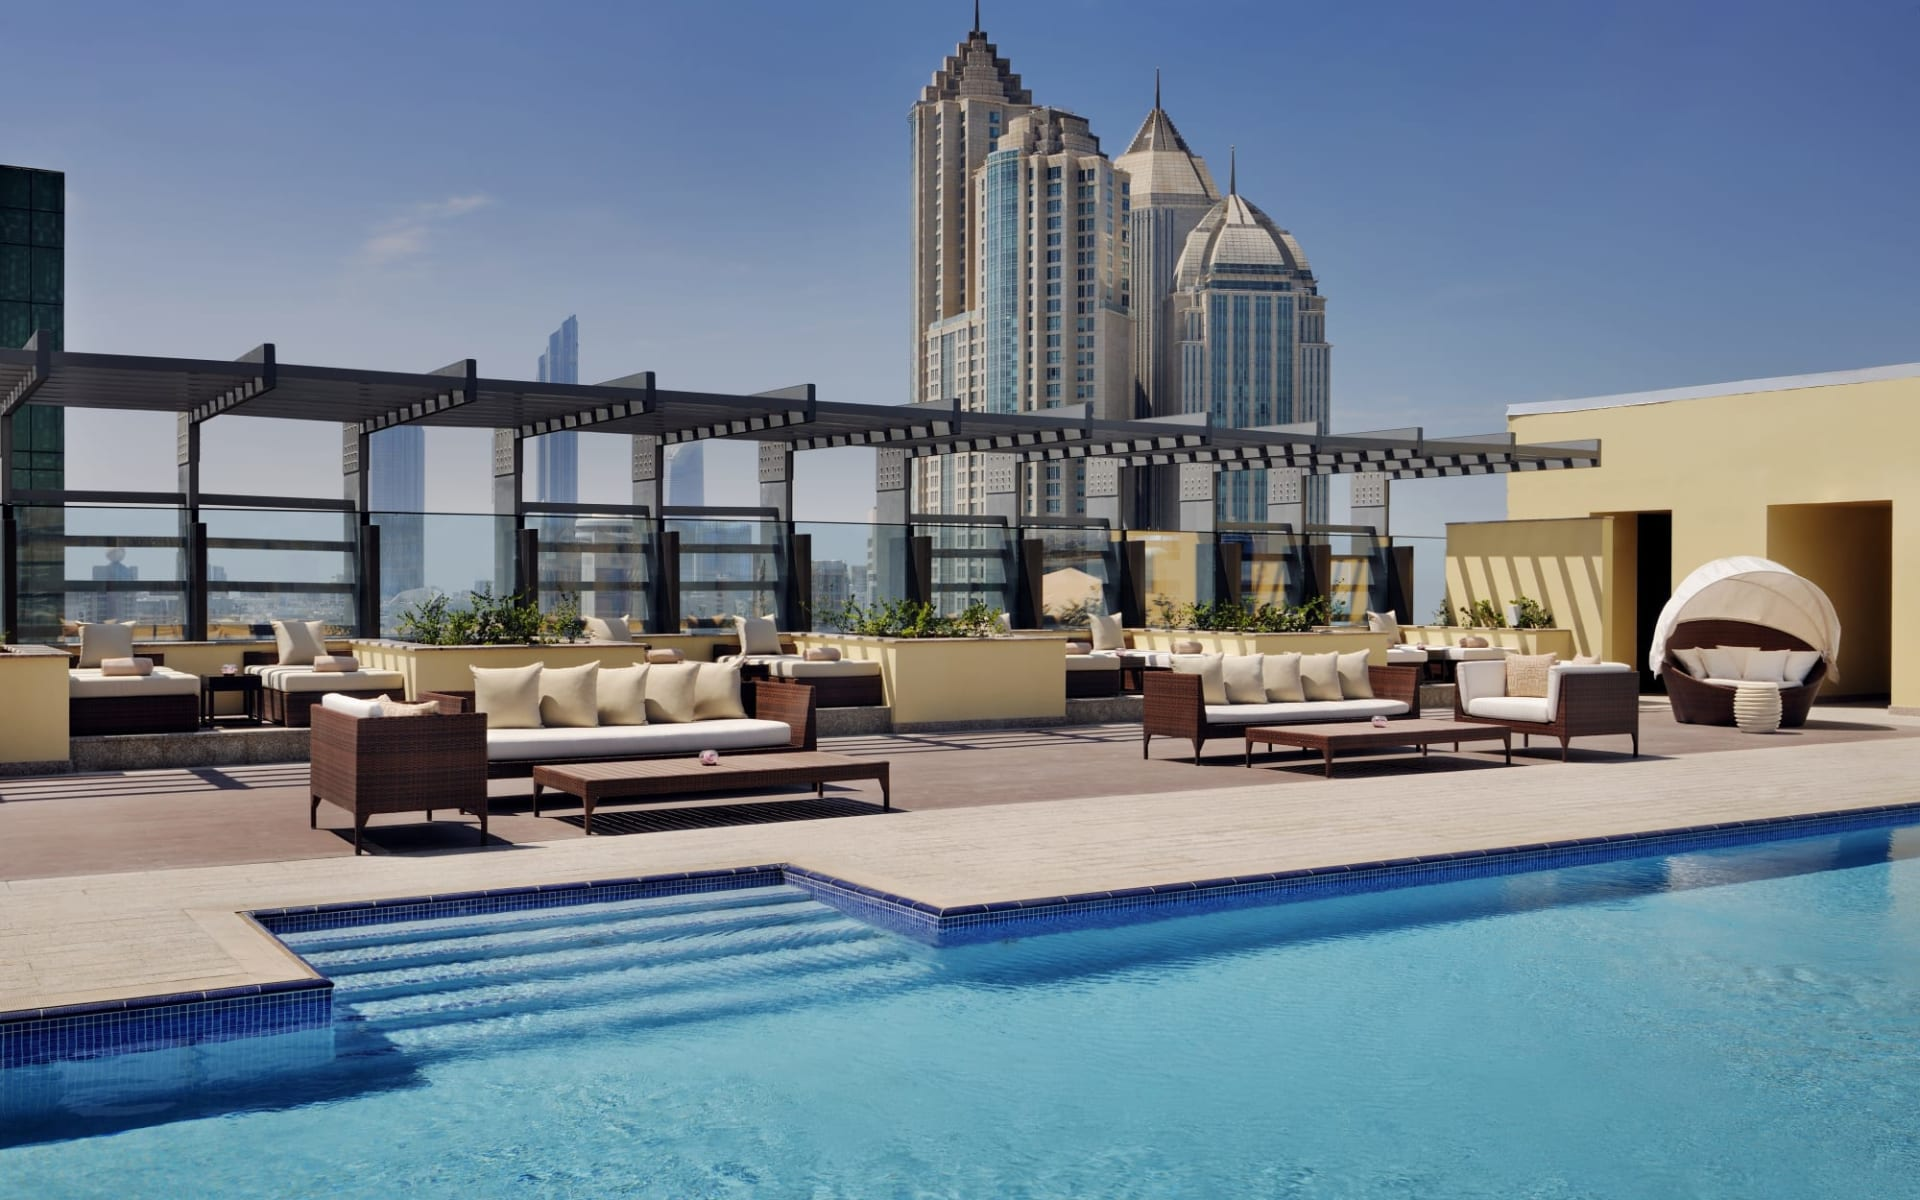 Southern Sun Abu Dhabi: